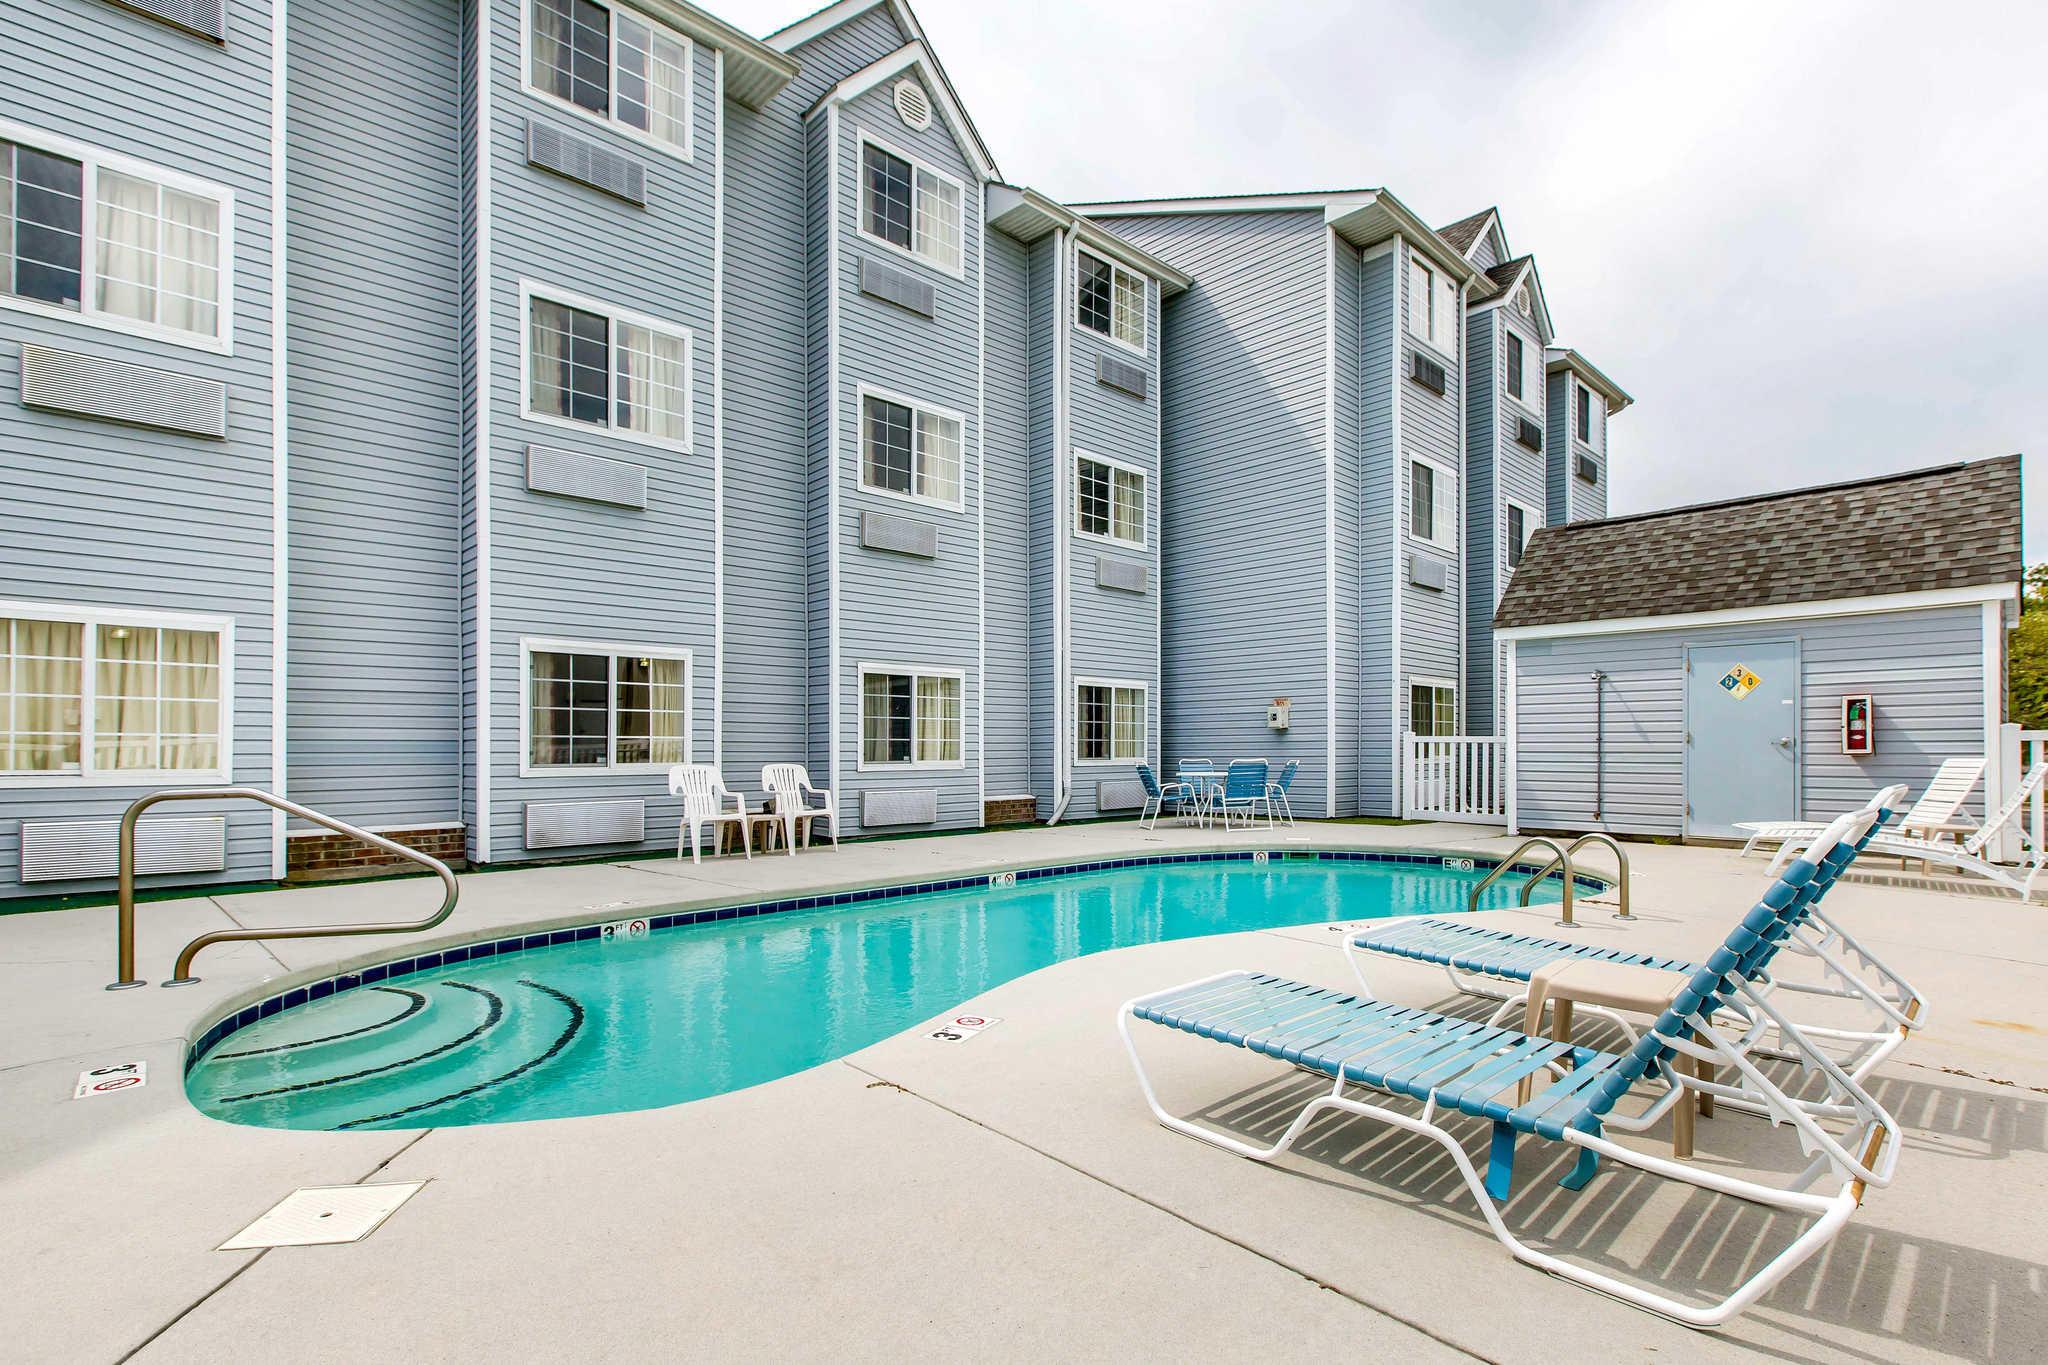 Rodeway Inn Amp Suites Shallotte North Carolina